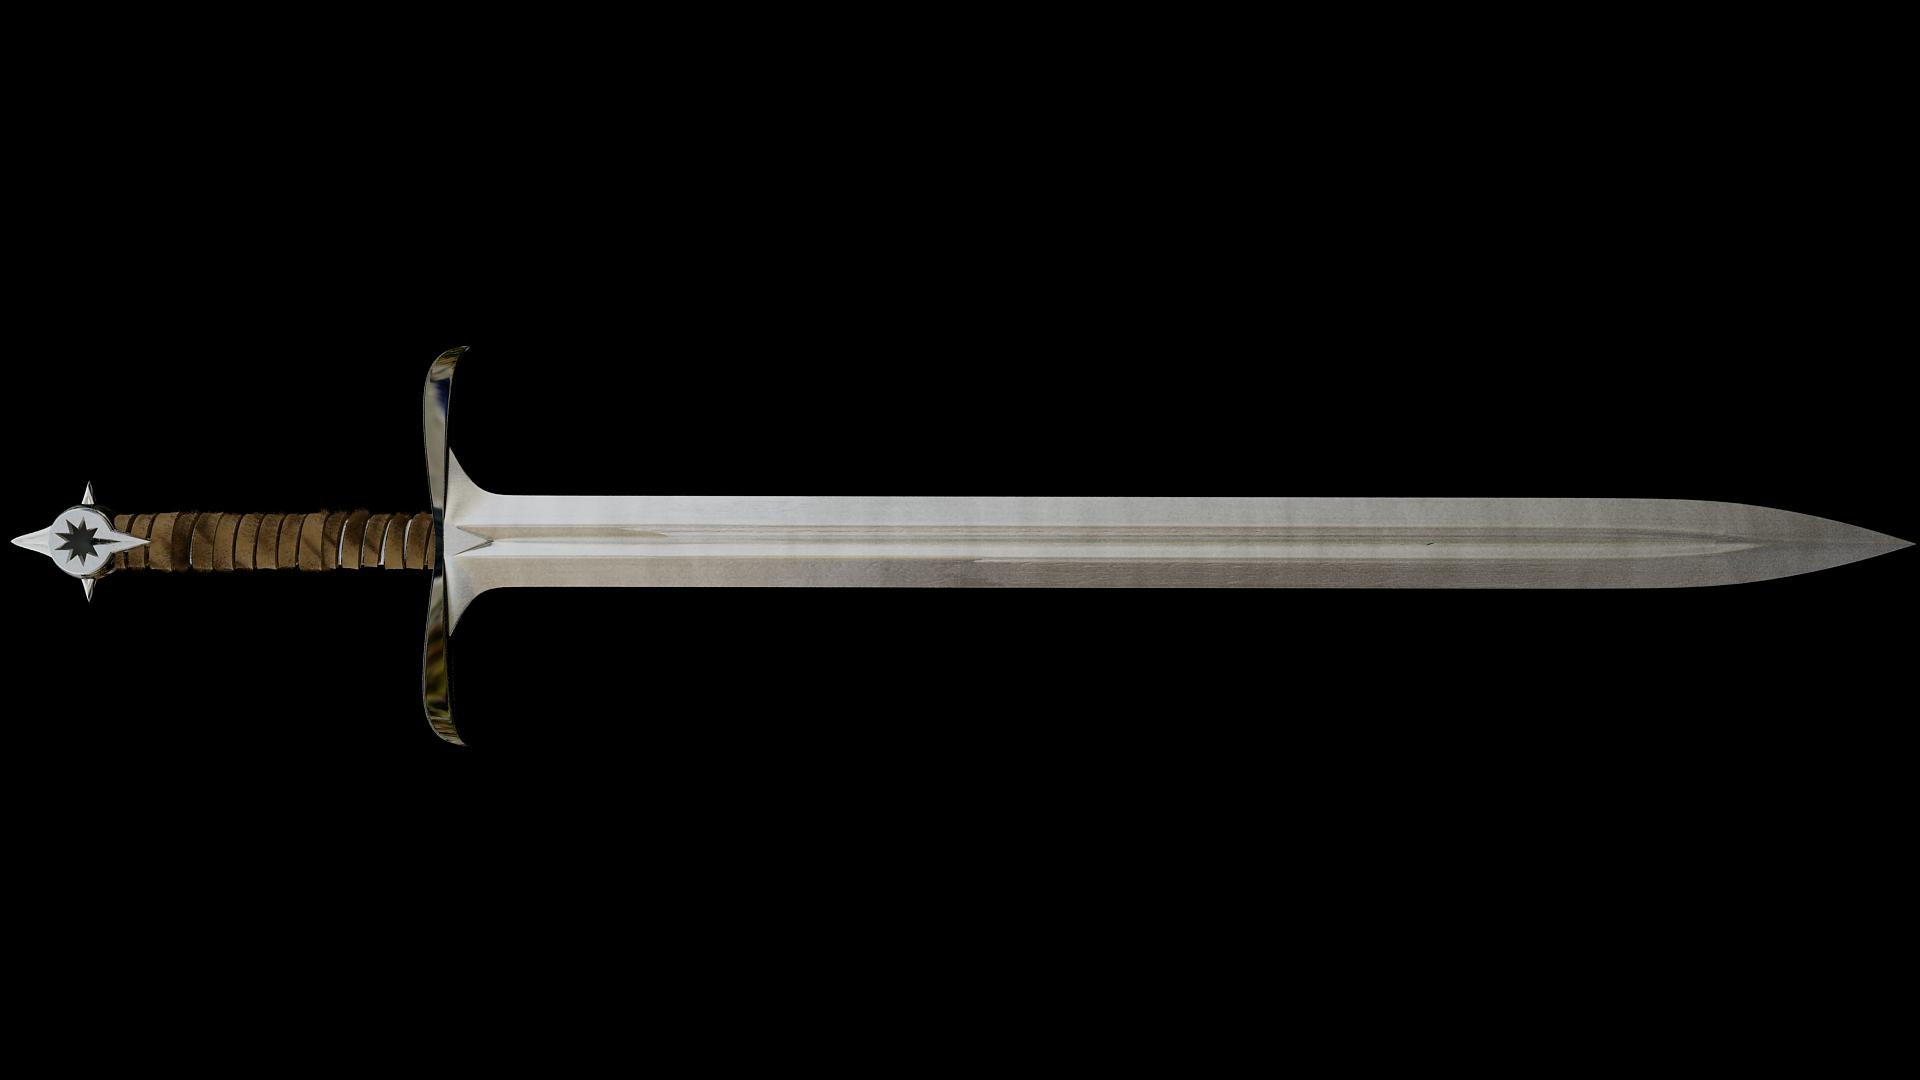 Sword HD PNG - 96737